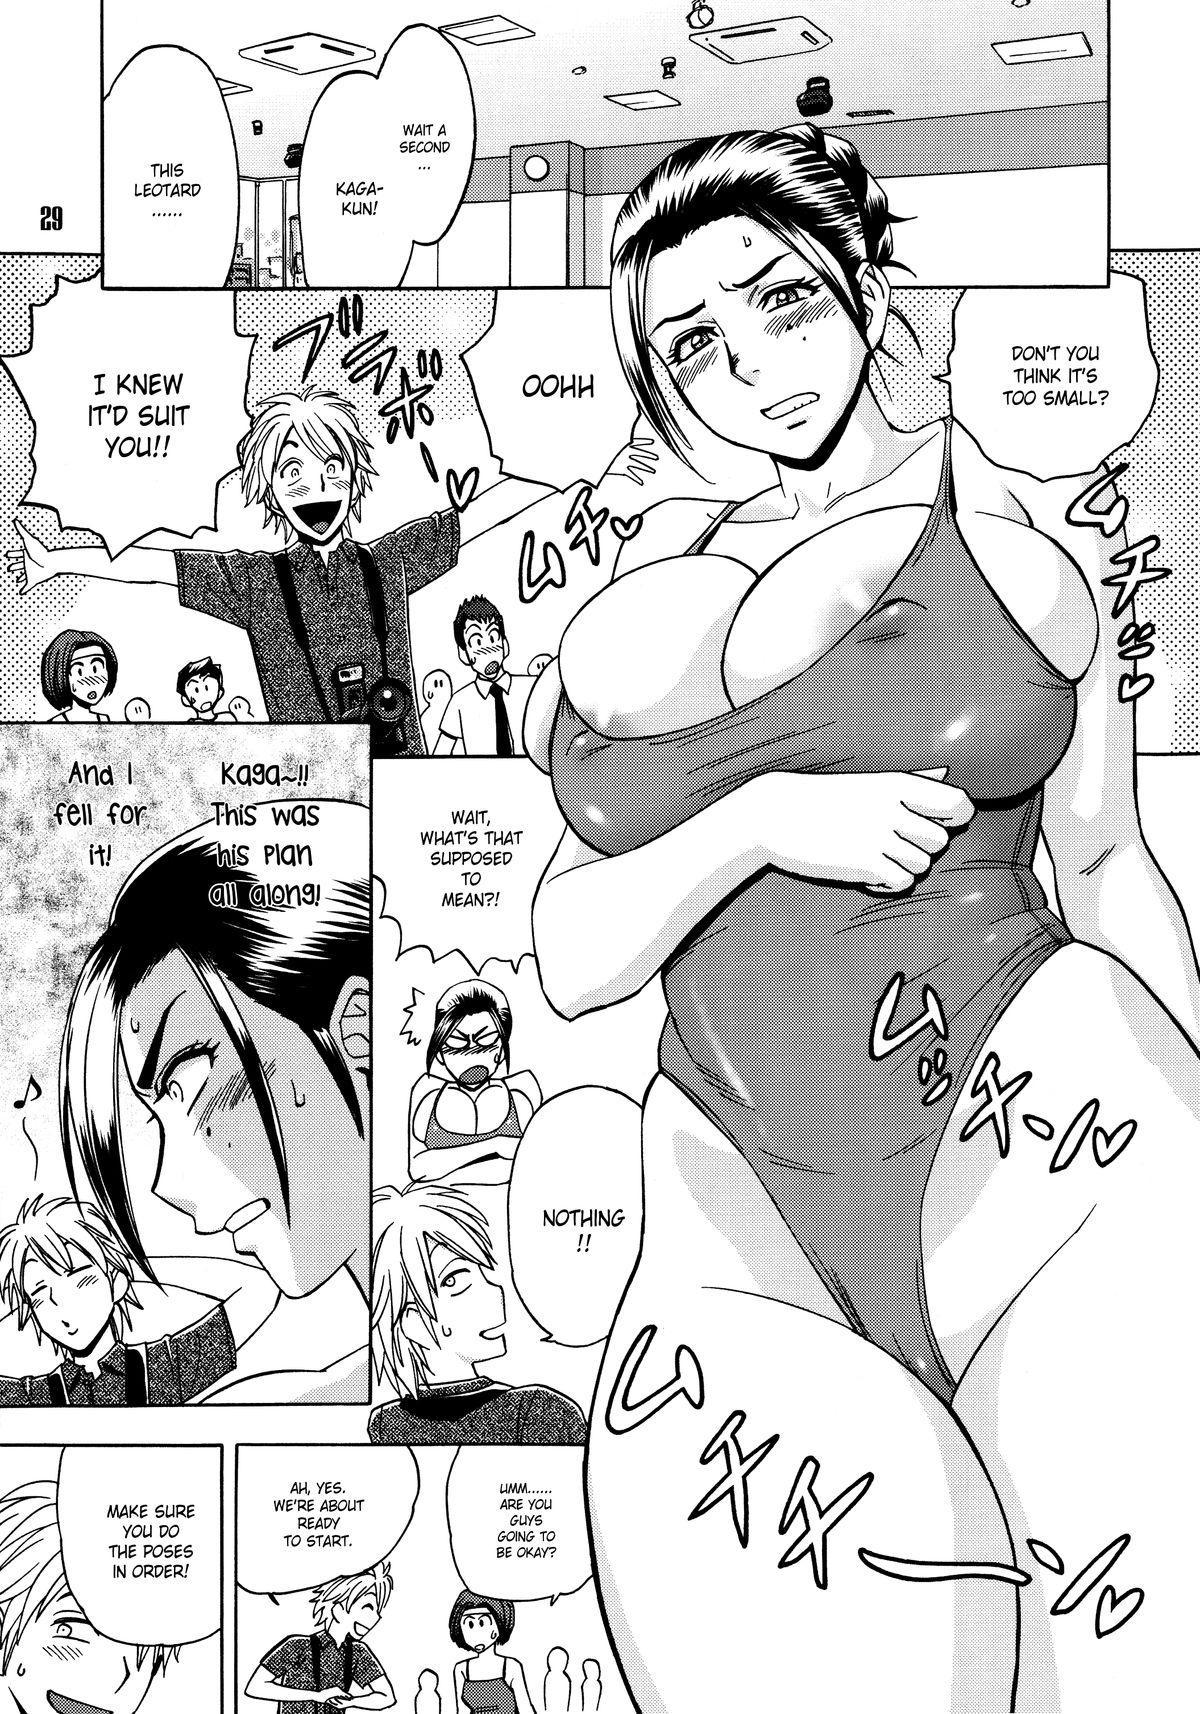 [Madam Project (Tatsunami Youtoku)] Bijin Henshuu-chou no Himitsu (1)   Beautiful Editor-in-Chief's Secret (1) [English] [Forbiddenfetish77] [Decensored] 28